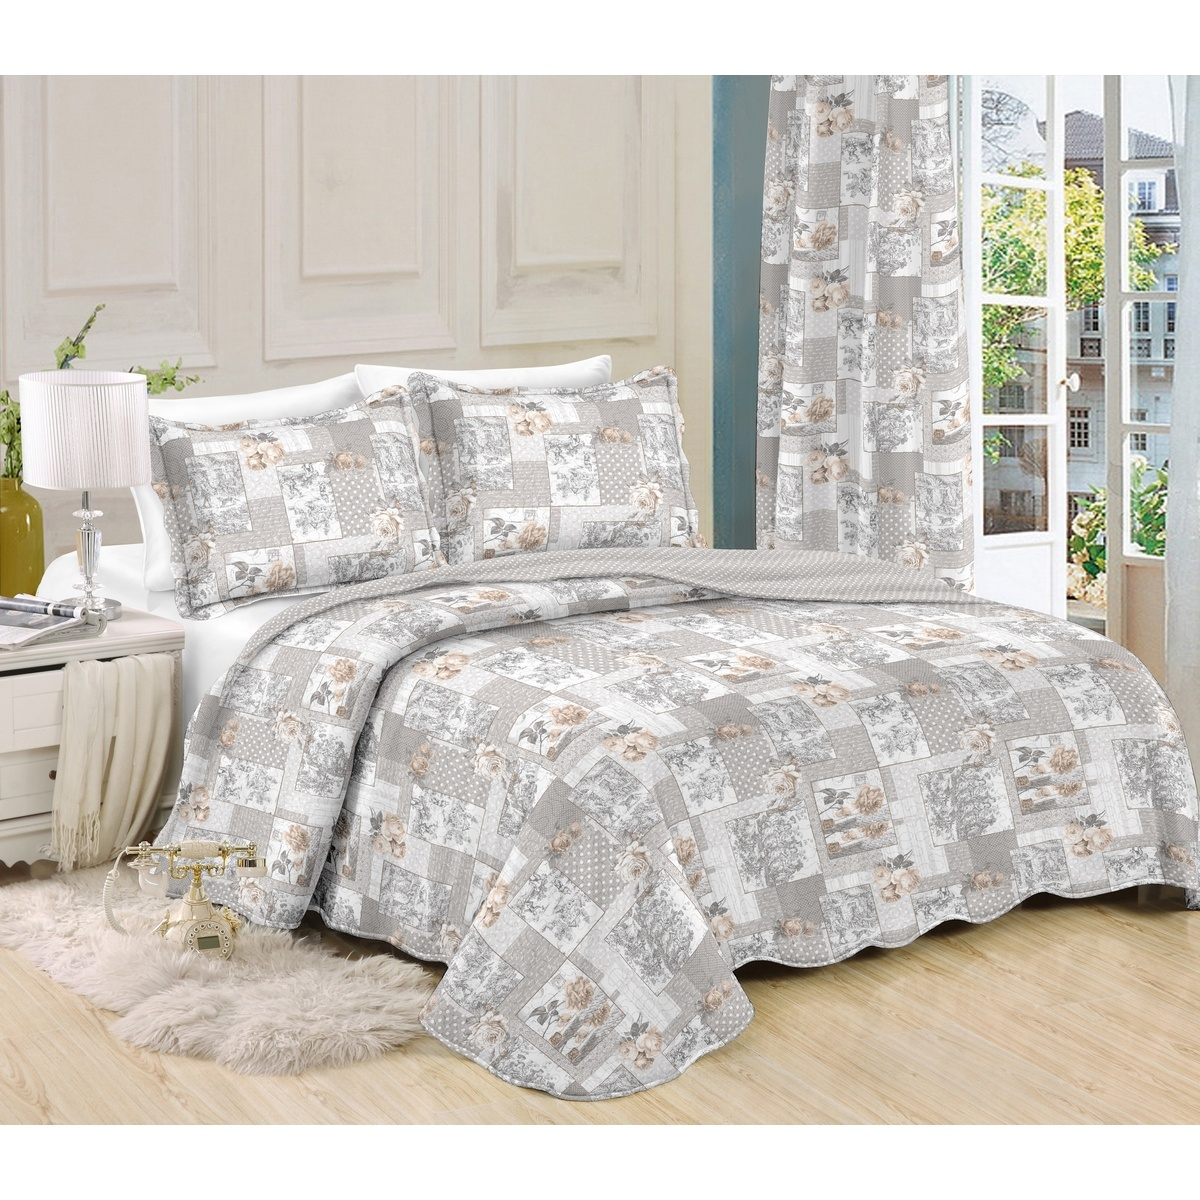 Přehoz na postel Patchwork Ina, 230 x 250 cm, 2 ks 50 x 70 cm, 230 x 250 cm